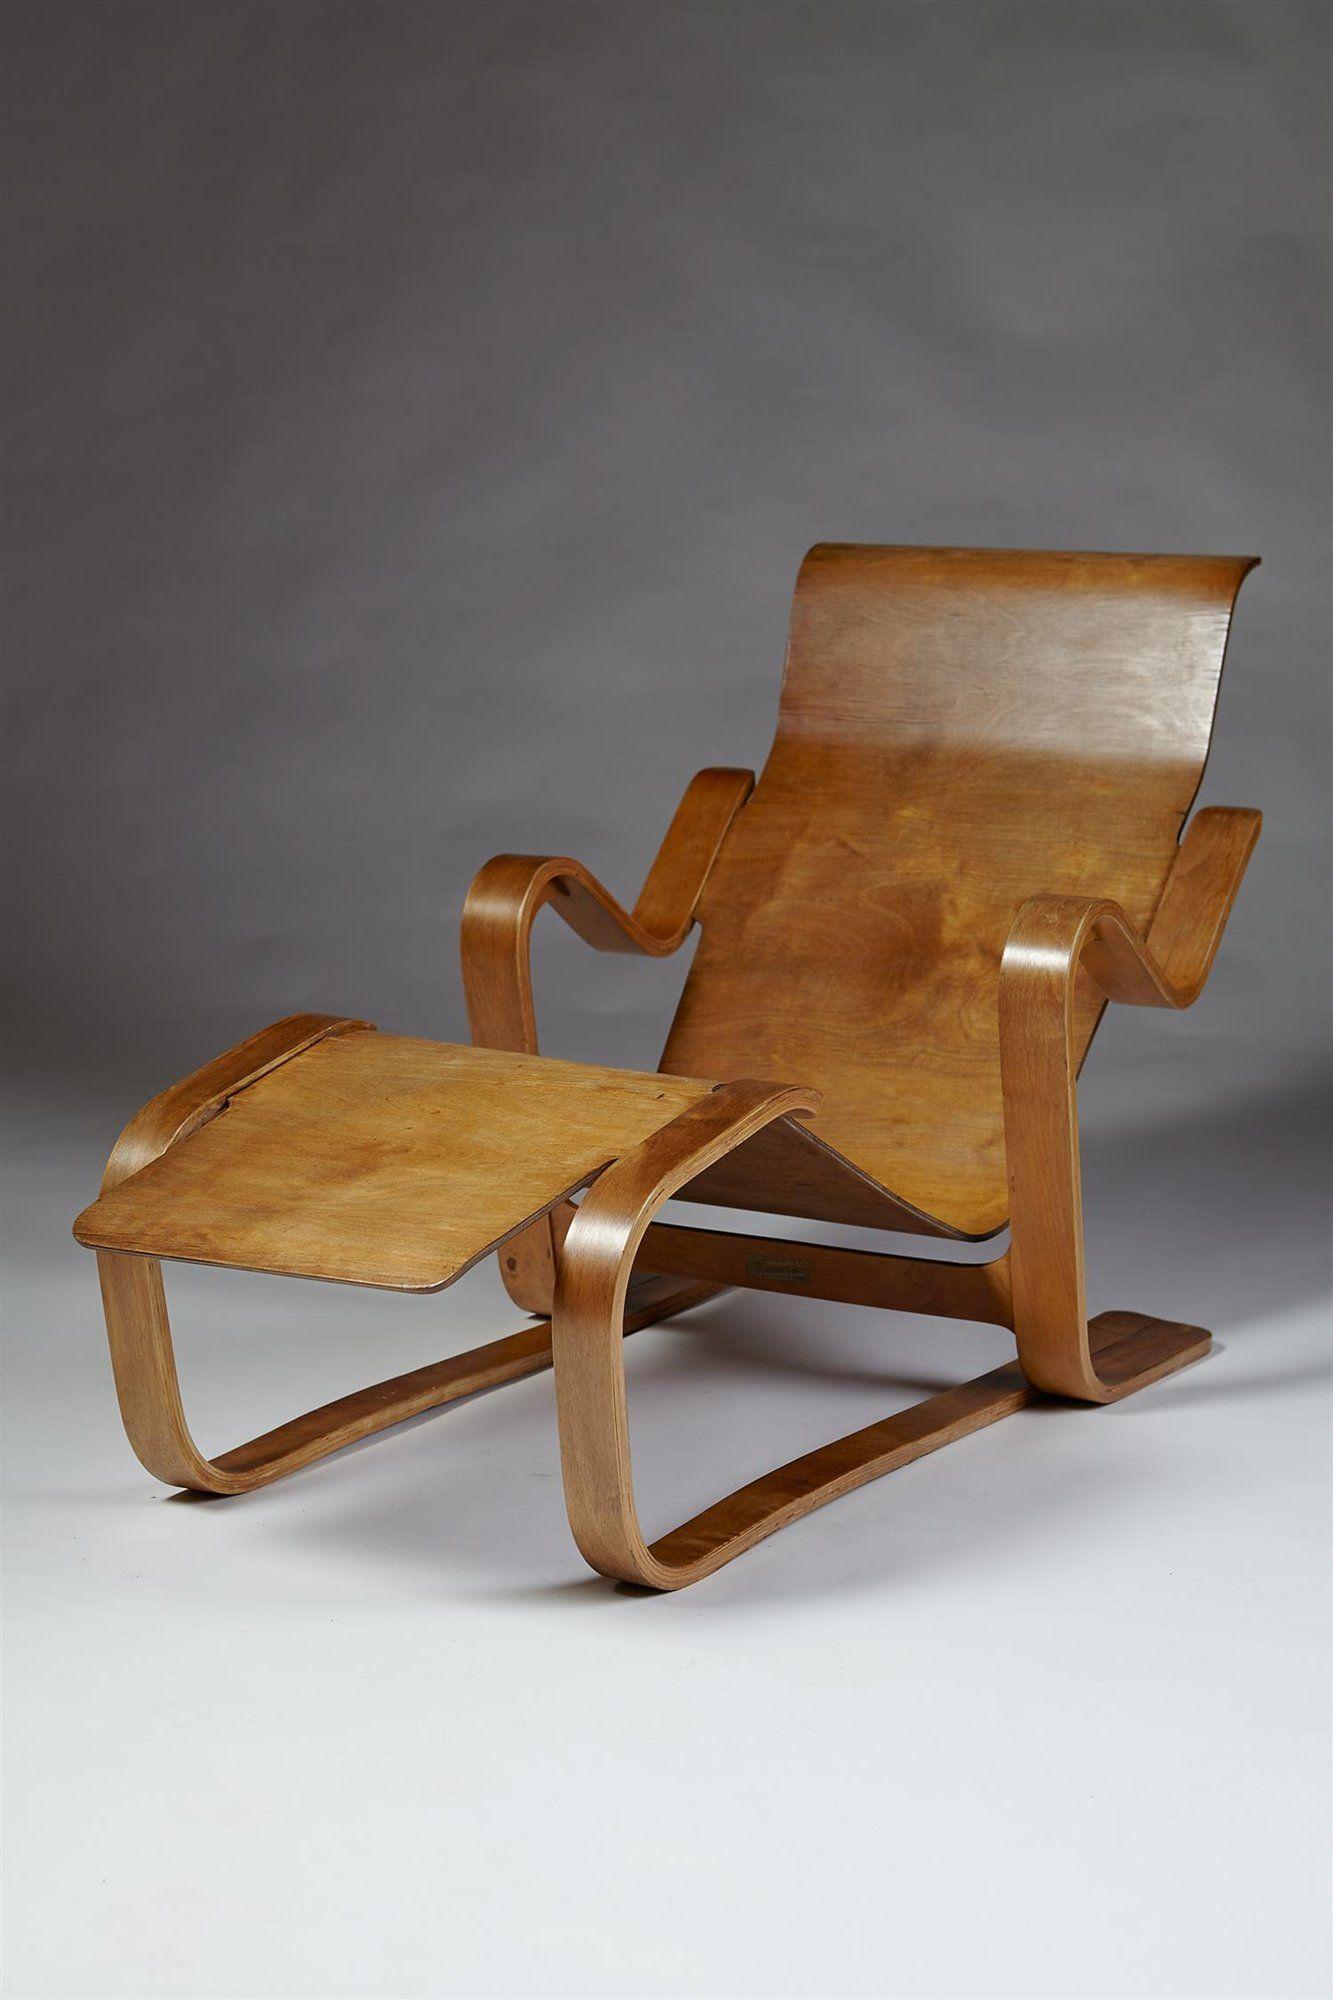 Marcel breuer birch long chair 1936 vintage 1930s home